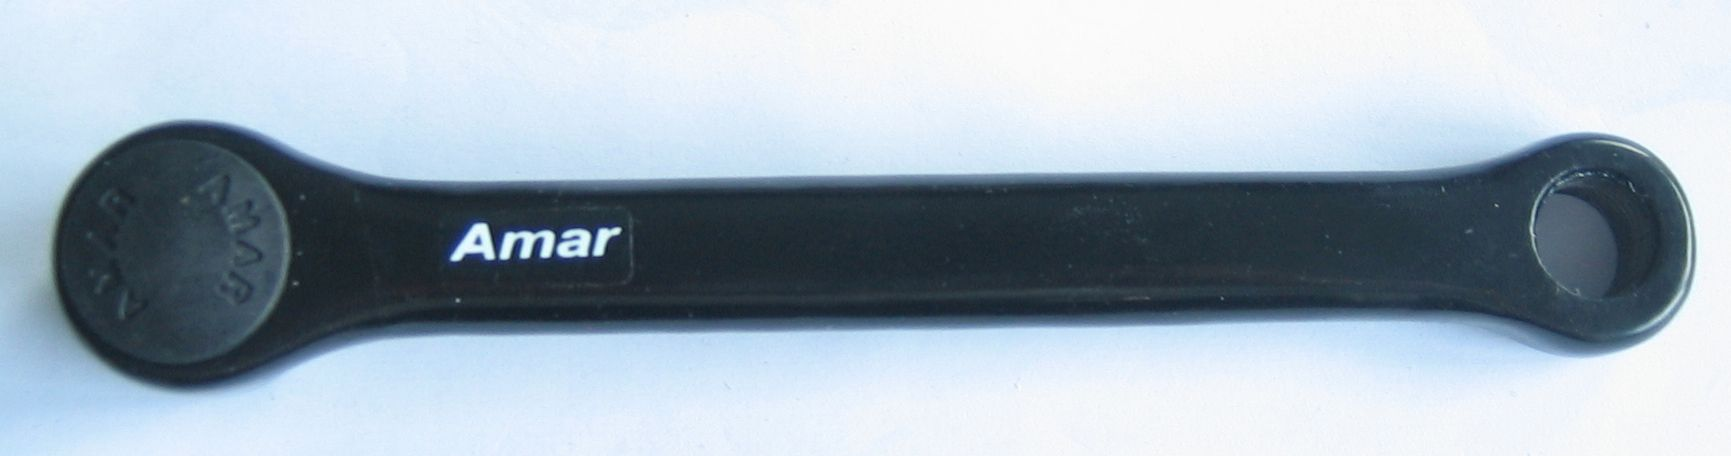 kettengarnitur (kettengarnitur): Amar  linke Kurbel 150 mm